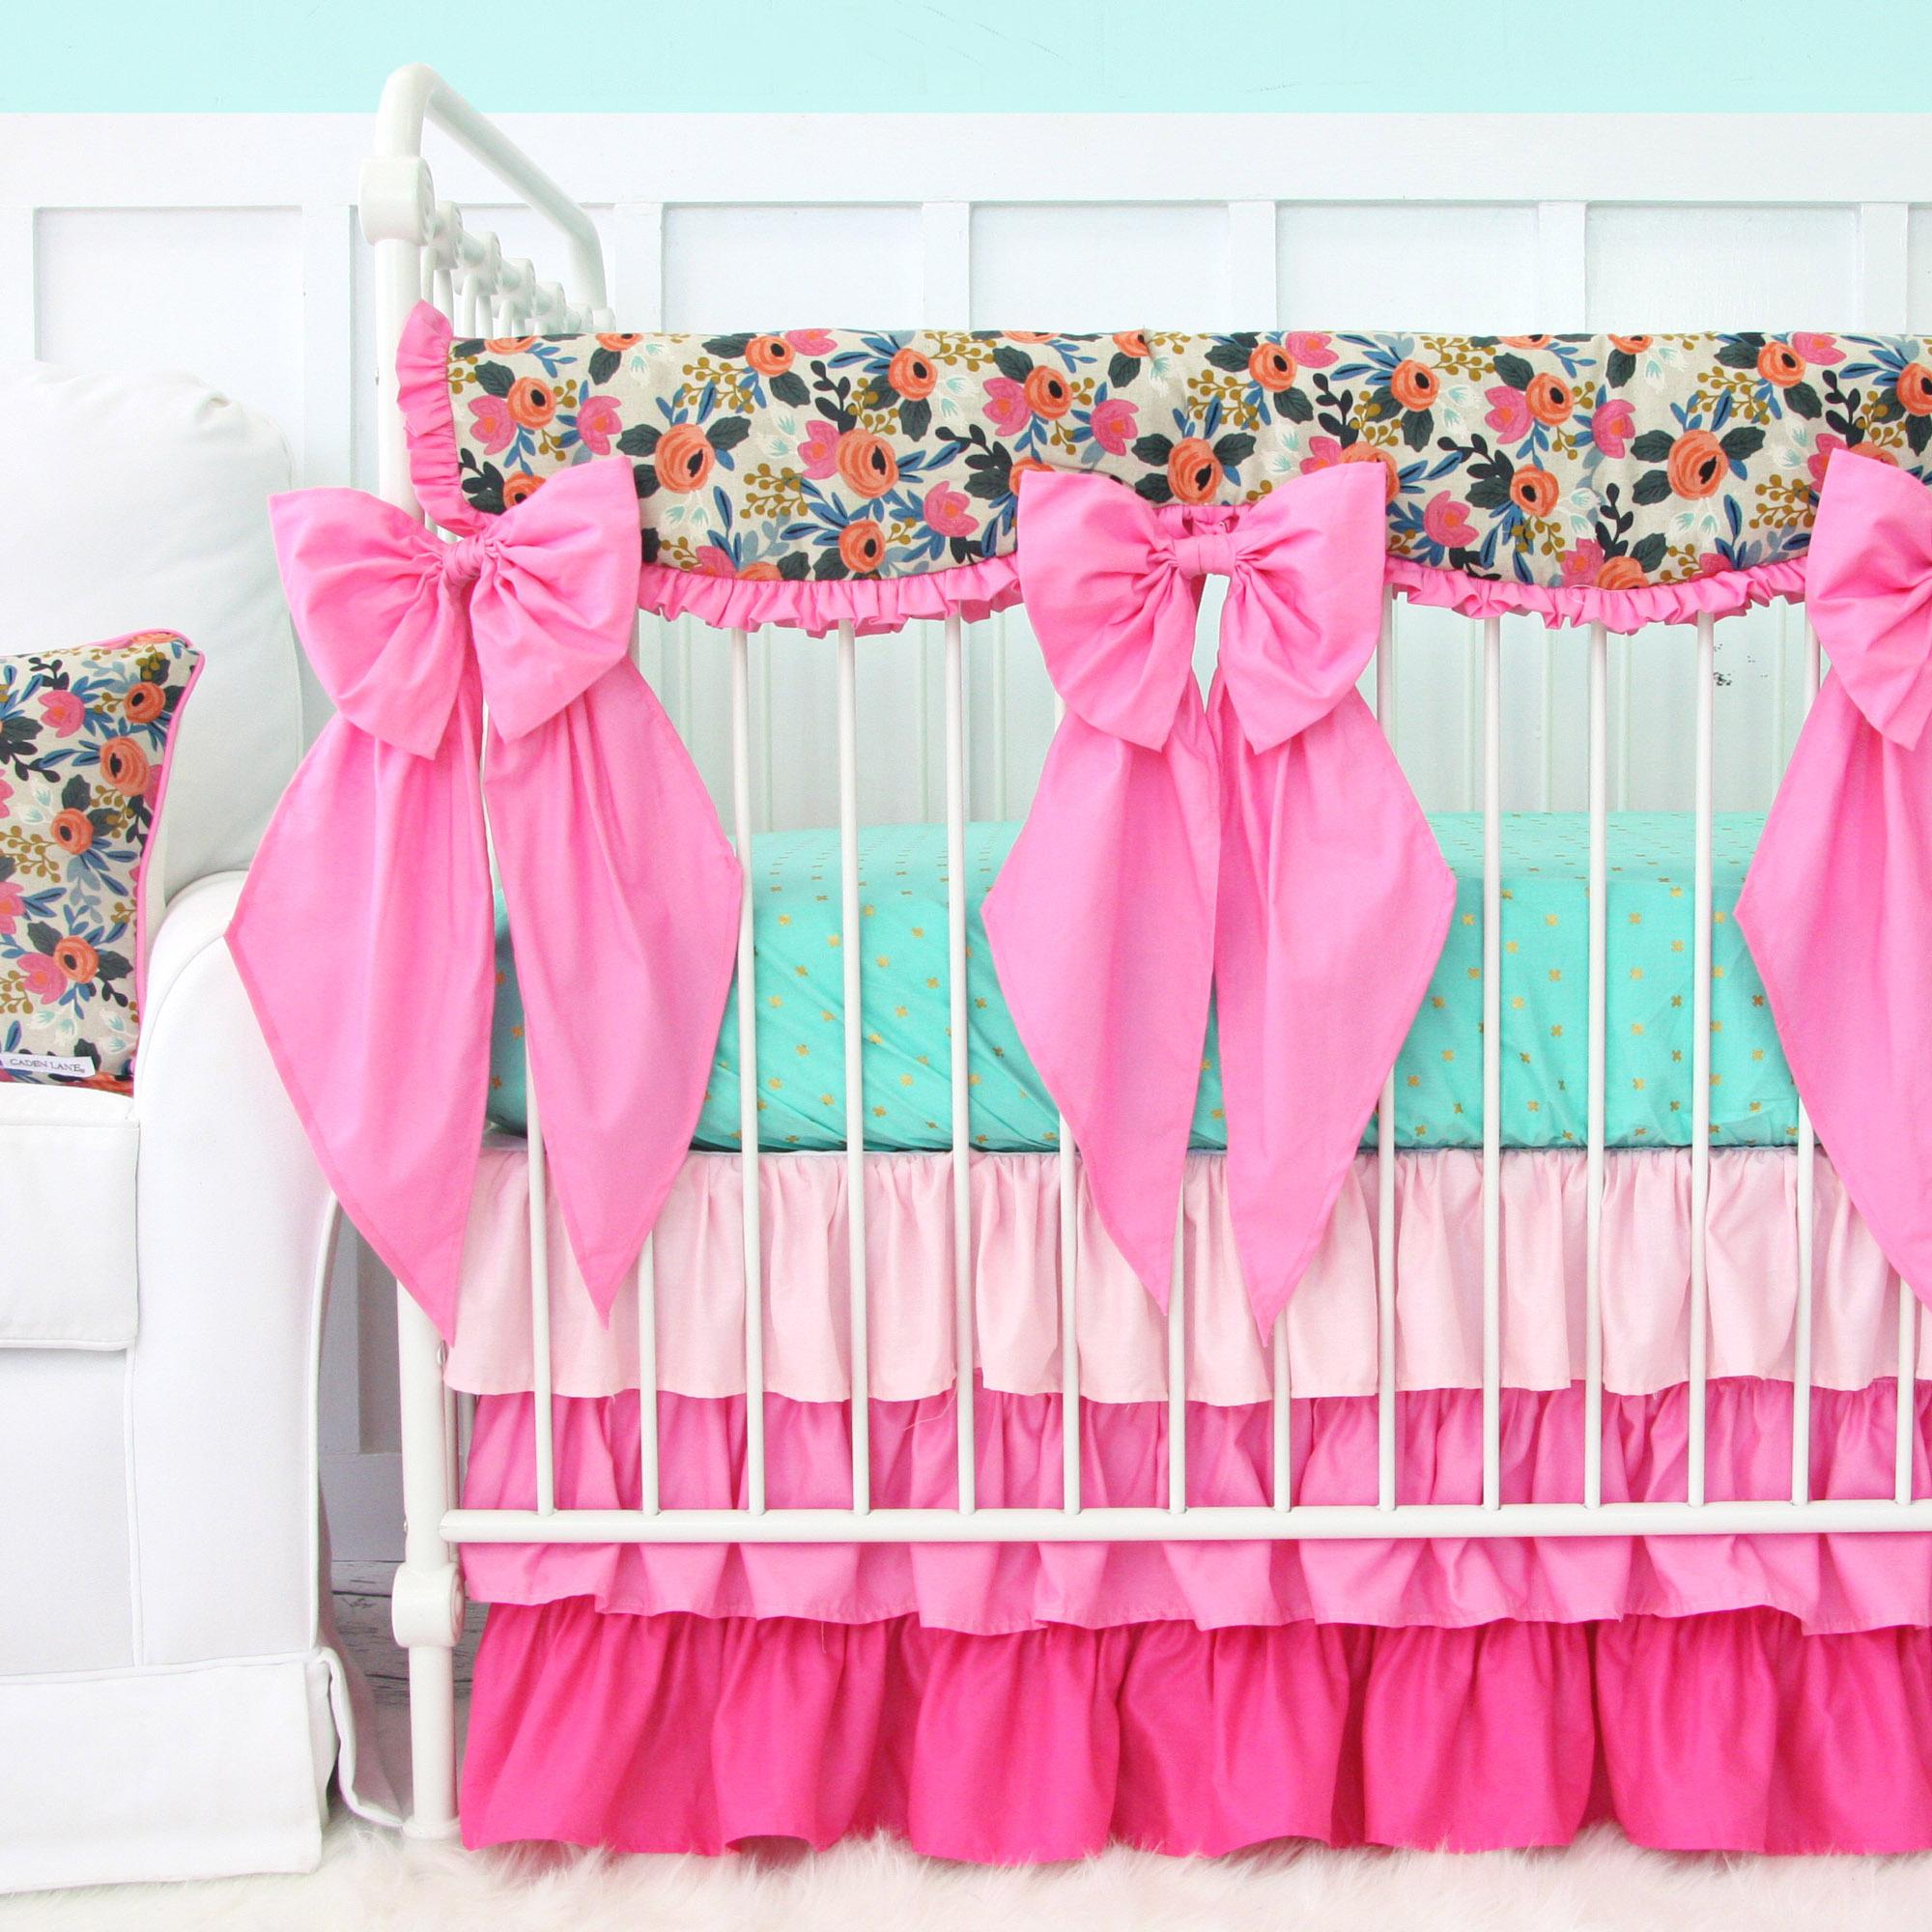 tinsleys-boho-floral-w-crib-bows